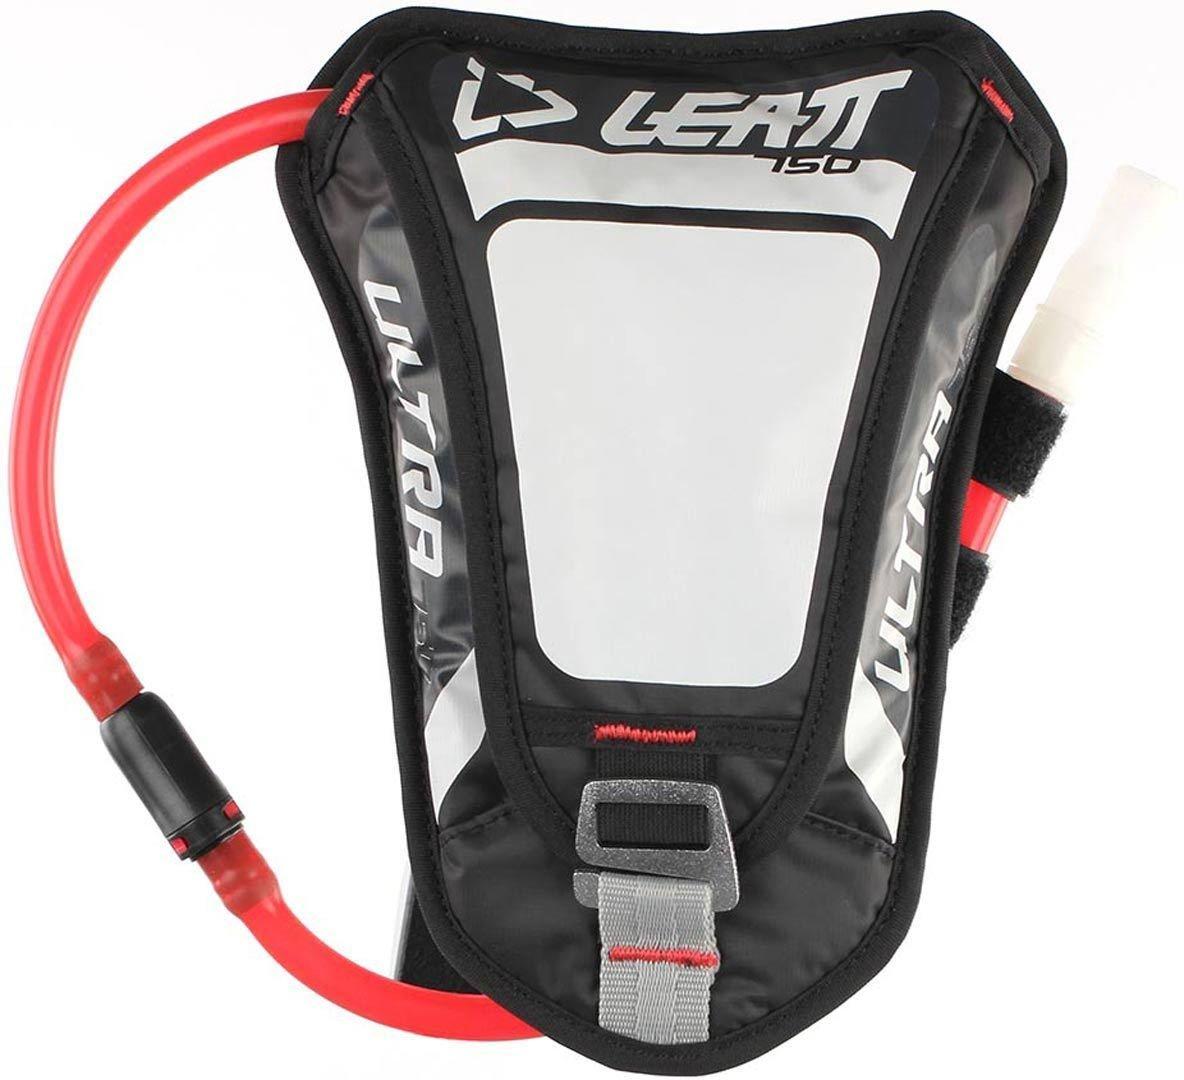 Leatt Ultra 750 HF Hydration System - Black/White / One Size 7016100160